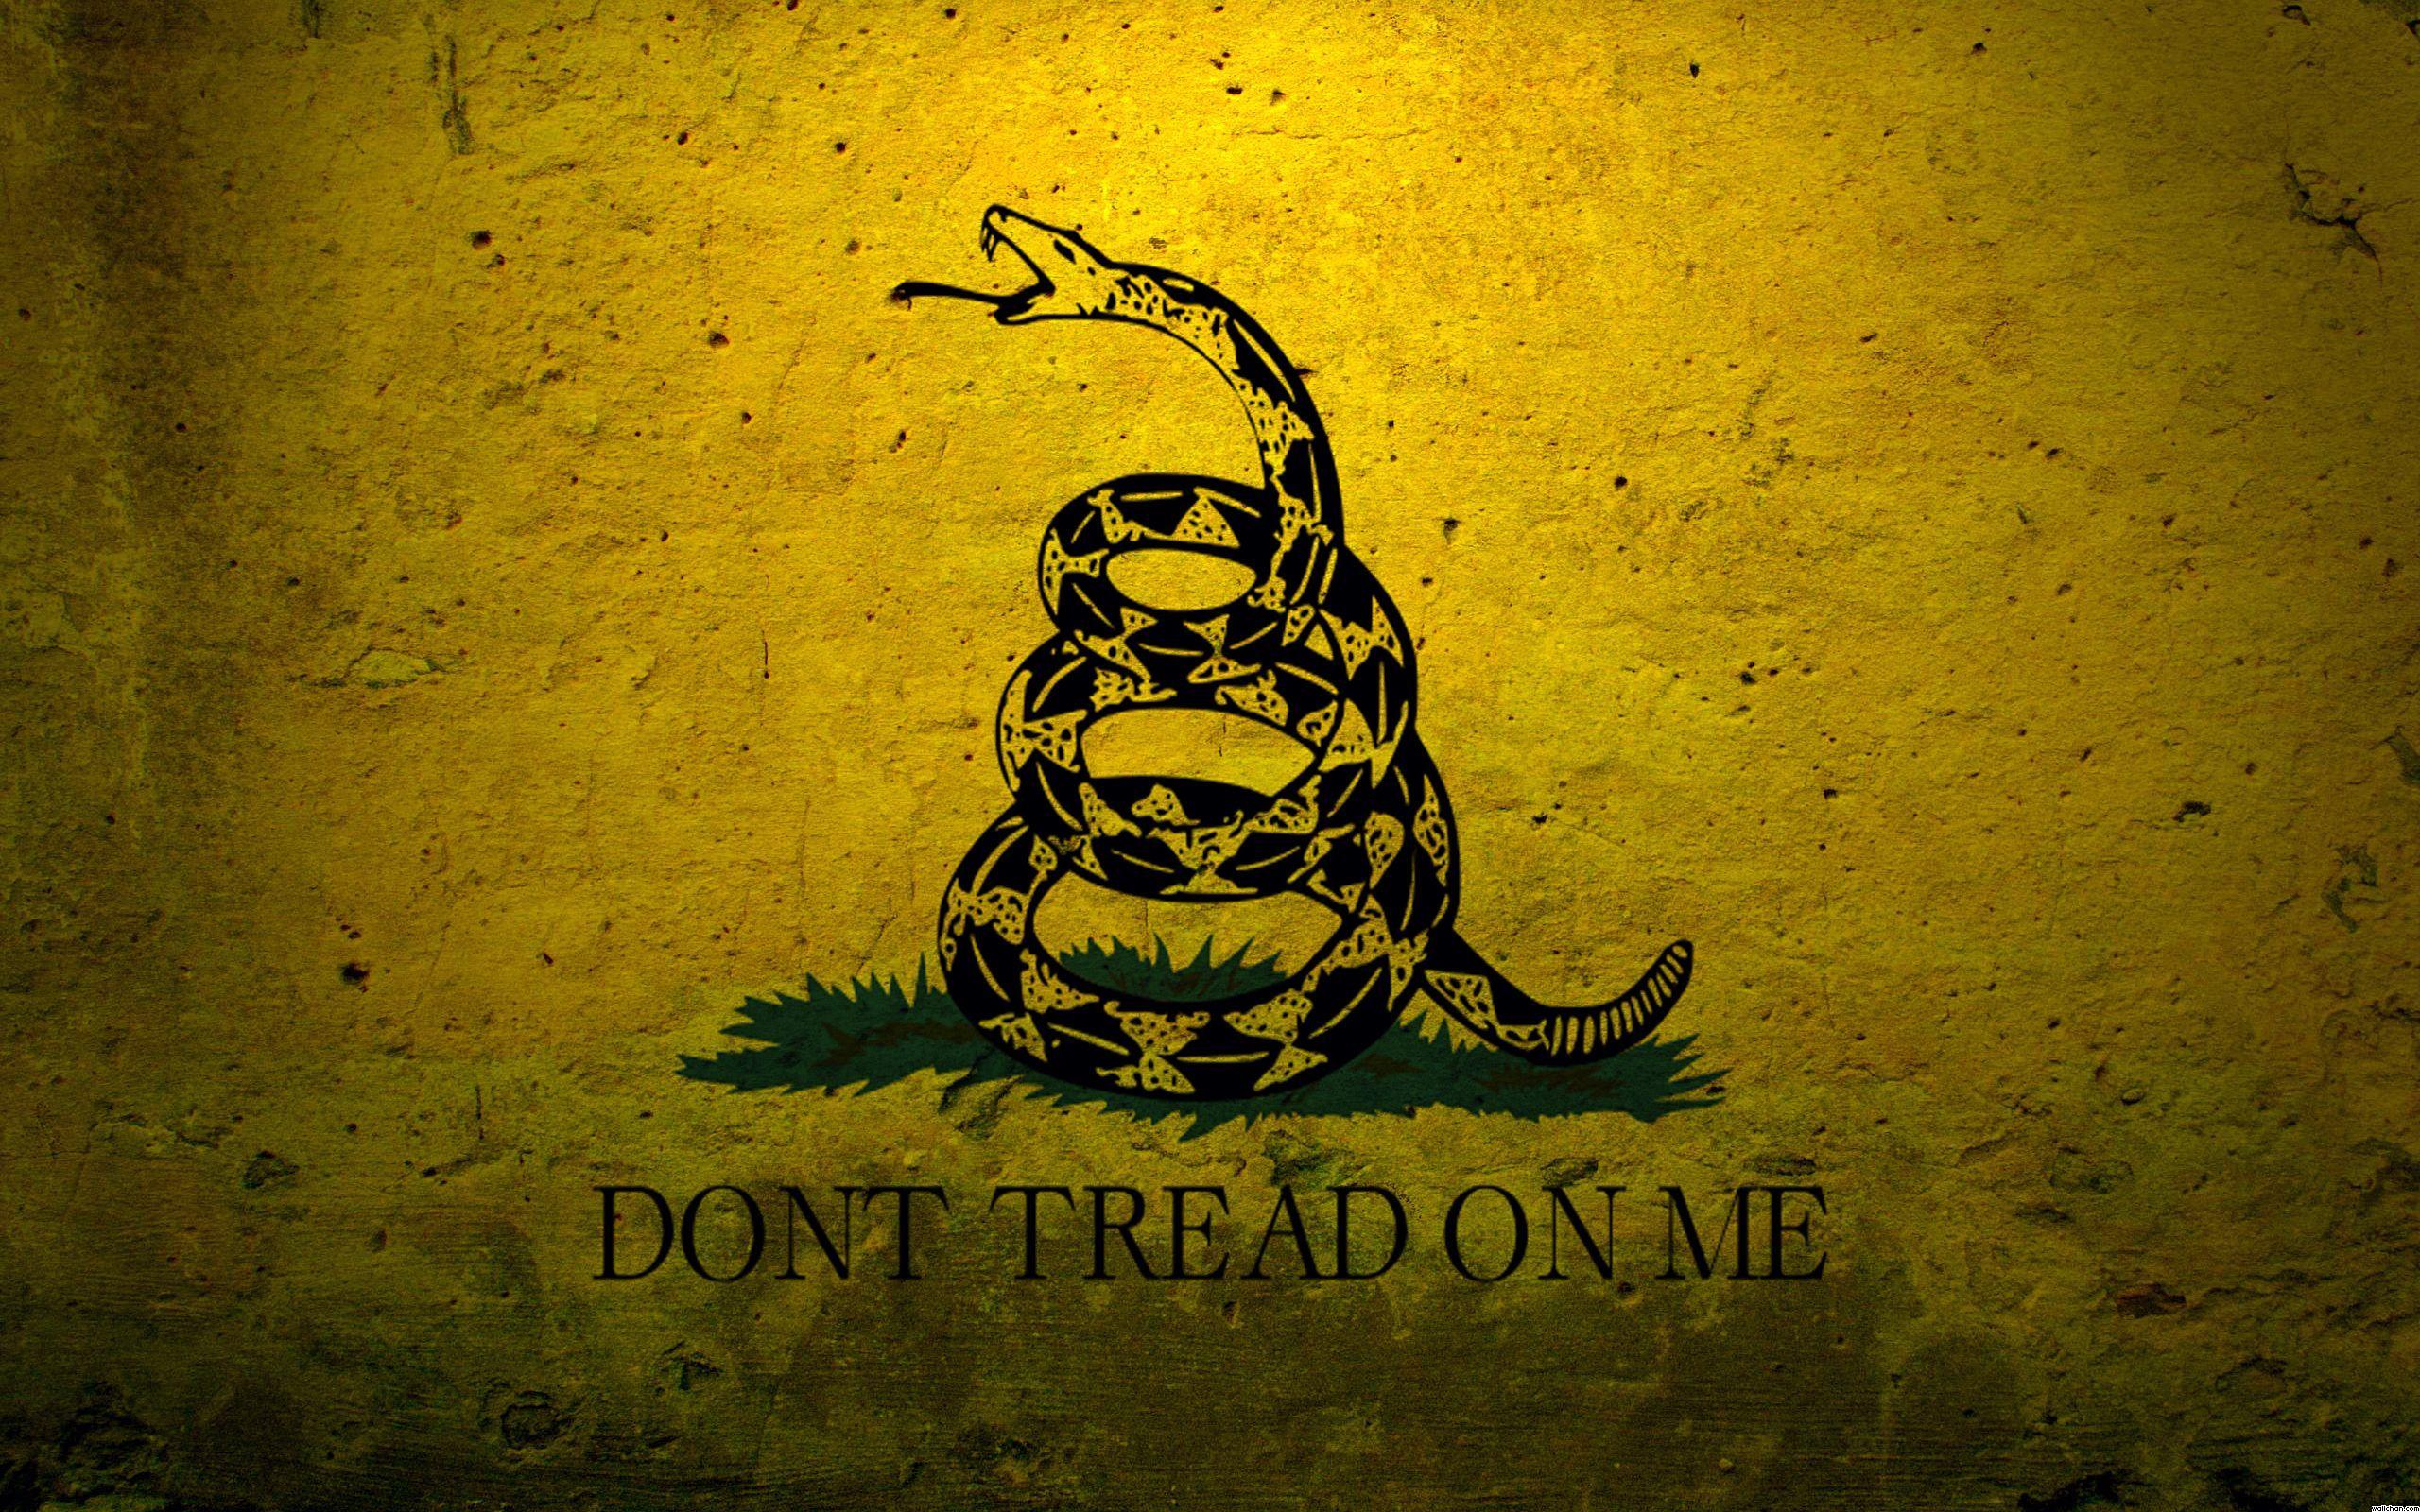 Gadsden Flag 01 X Gadsden Flag American Flag Wallpaper Dont Tread On Me